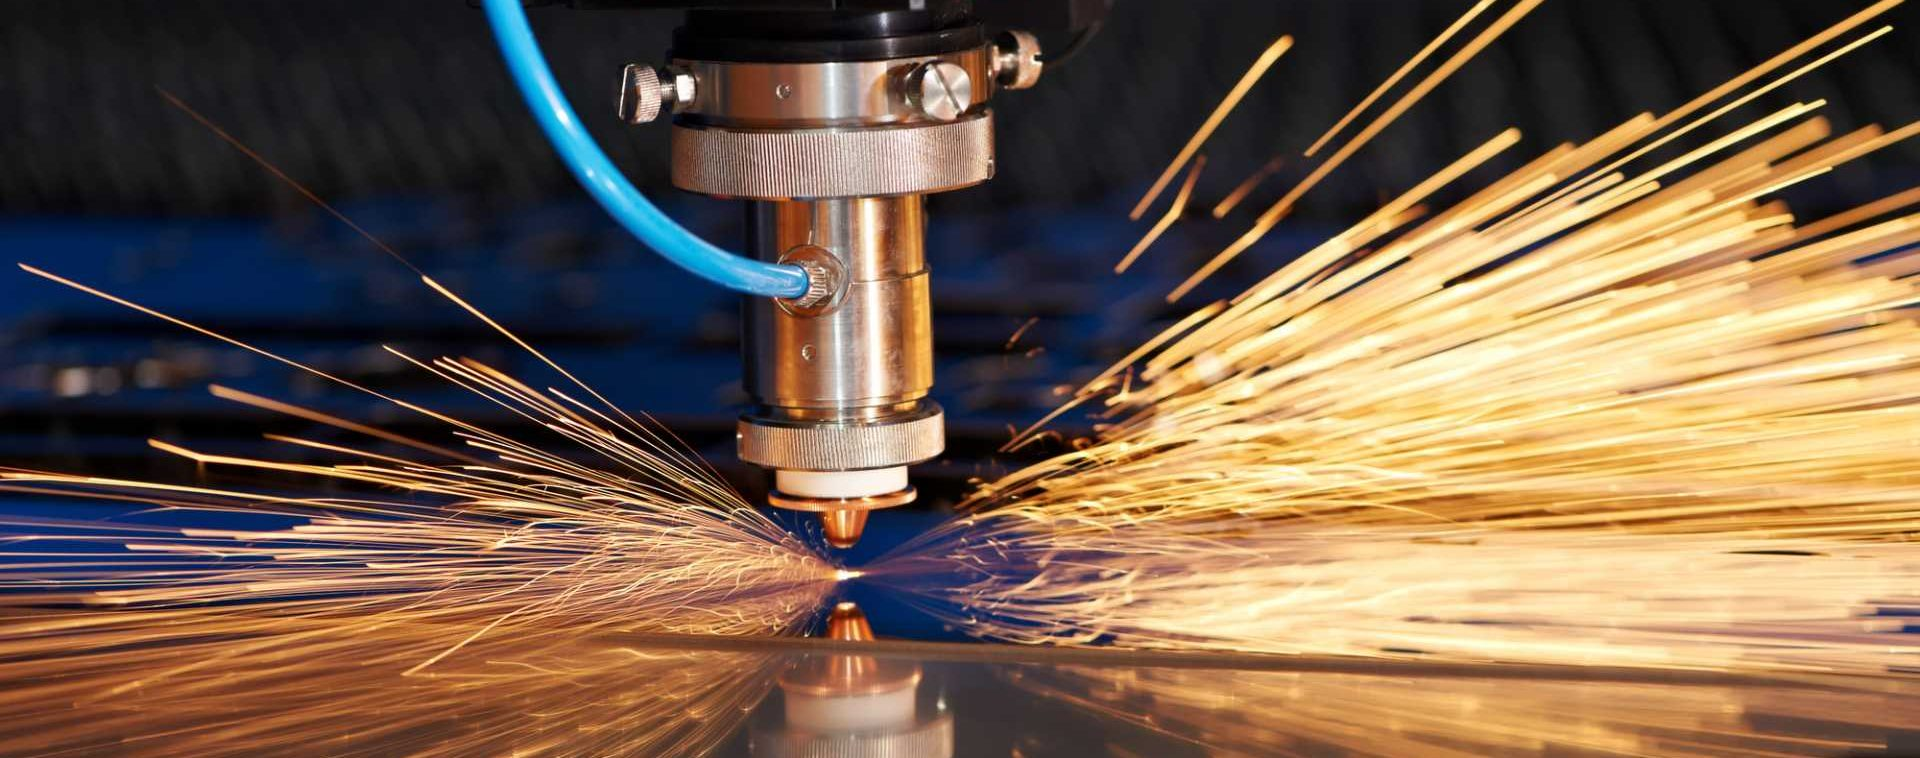 engineering manufacturing depositphotos